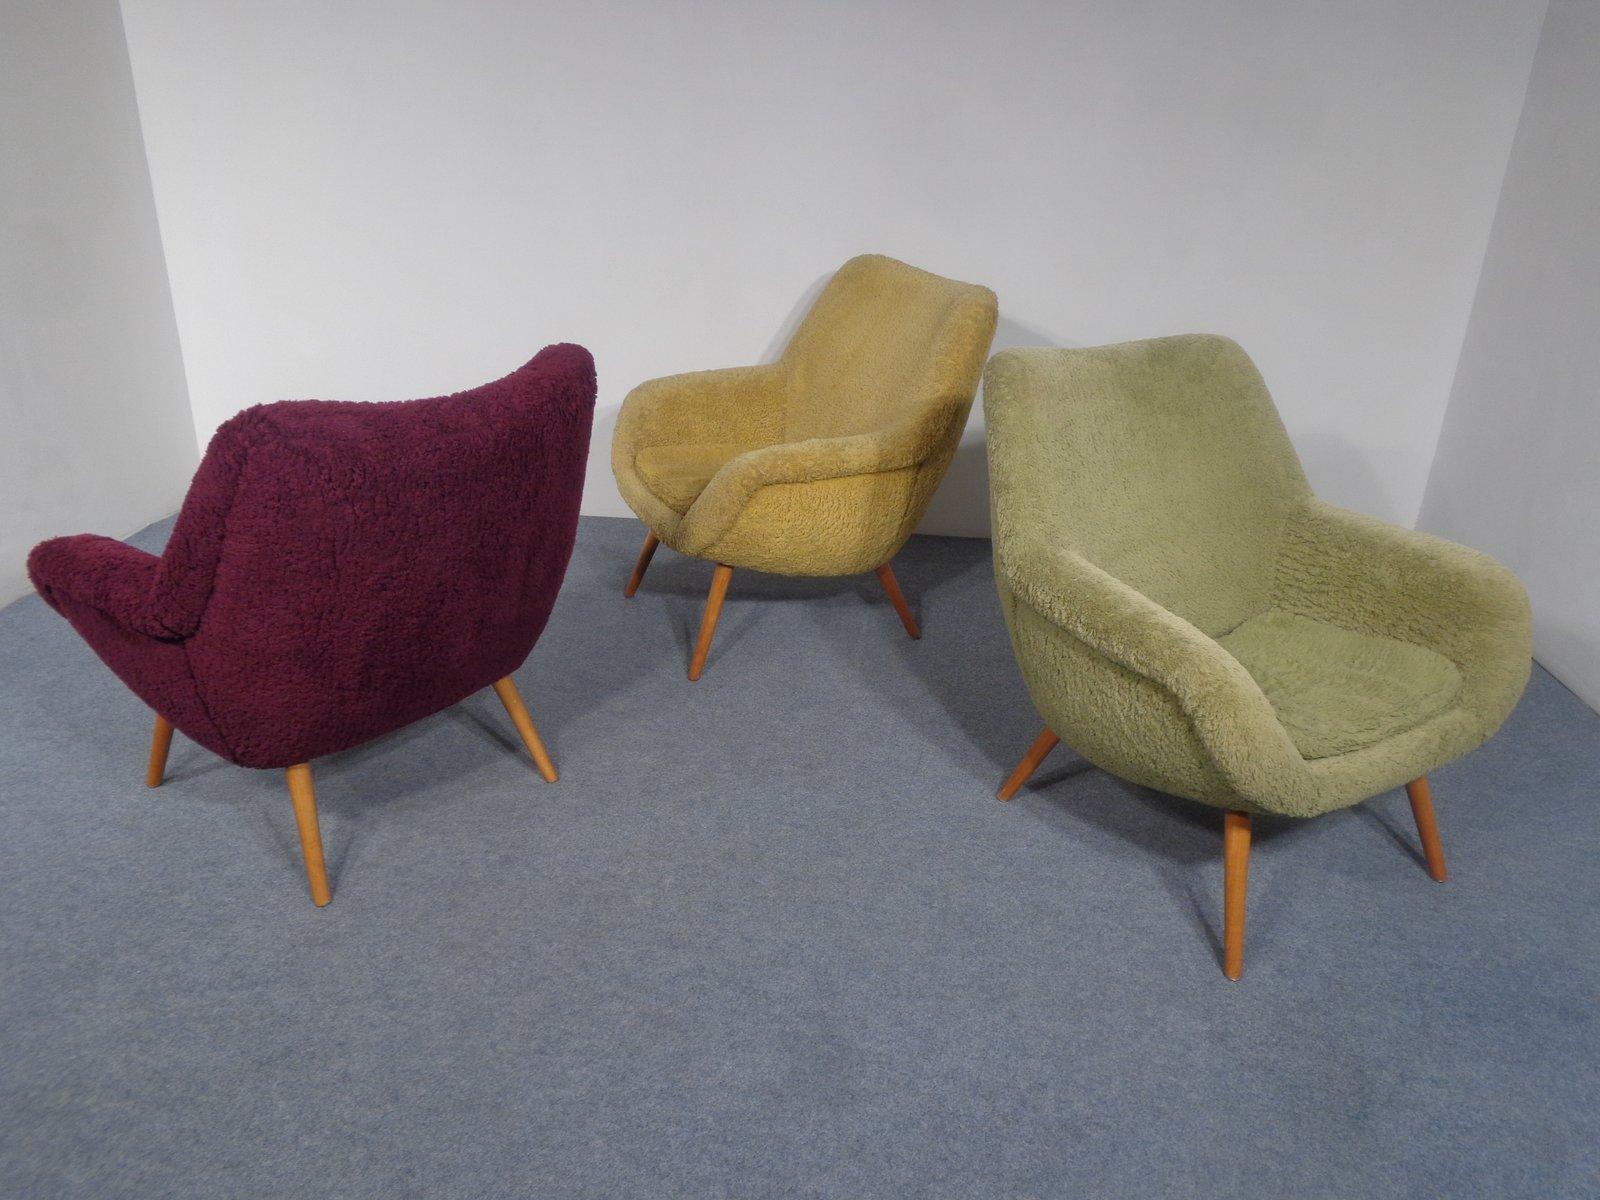 mid century sessel in gelb gr n und lila 1950er 3er set bei pamono kaufen. Black Bedroom Furniture Sets. Home Design Ideas